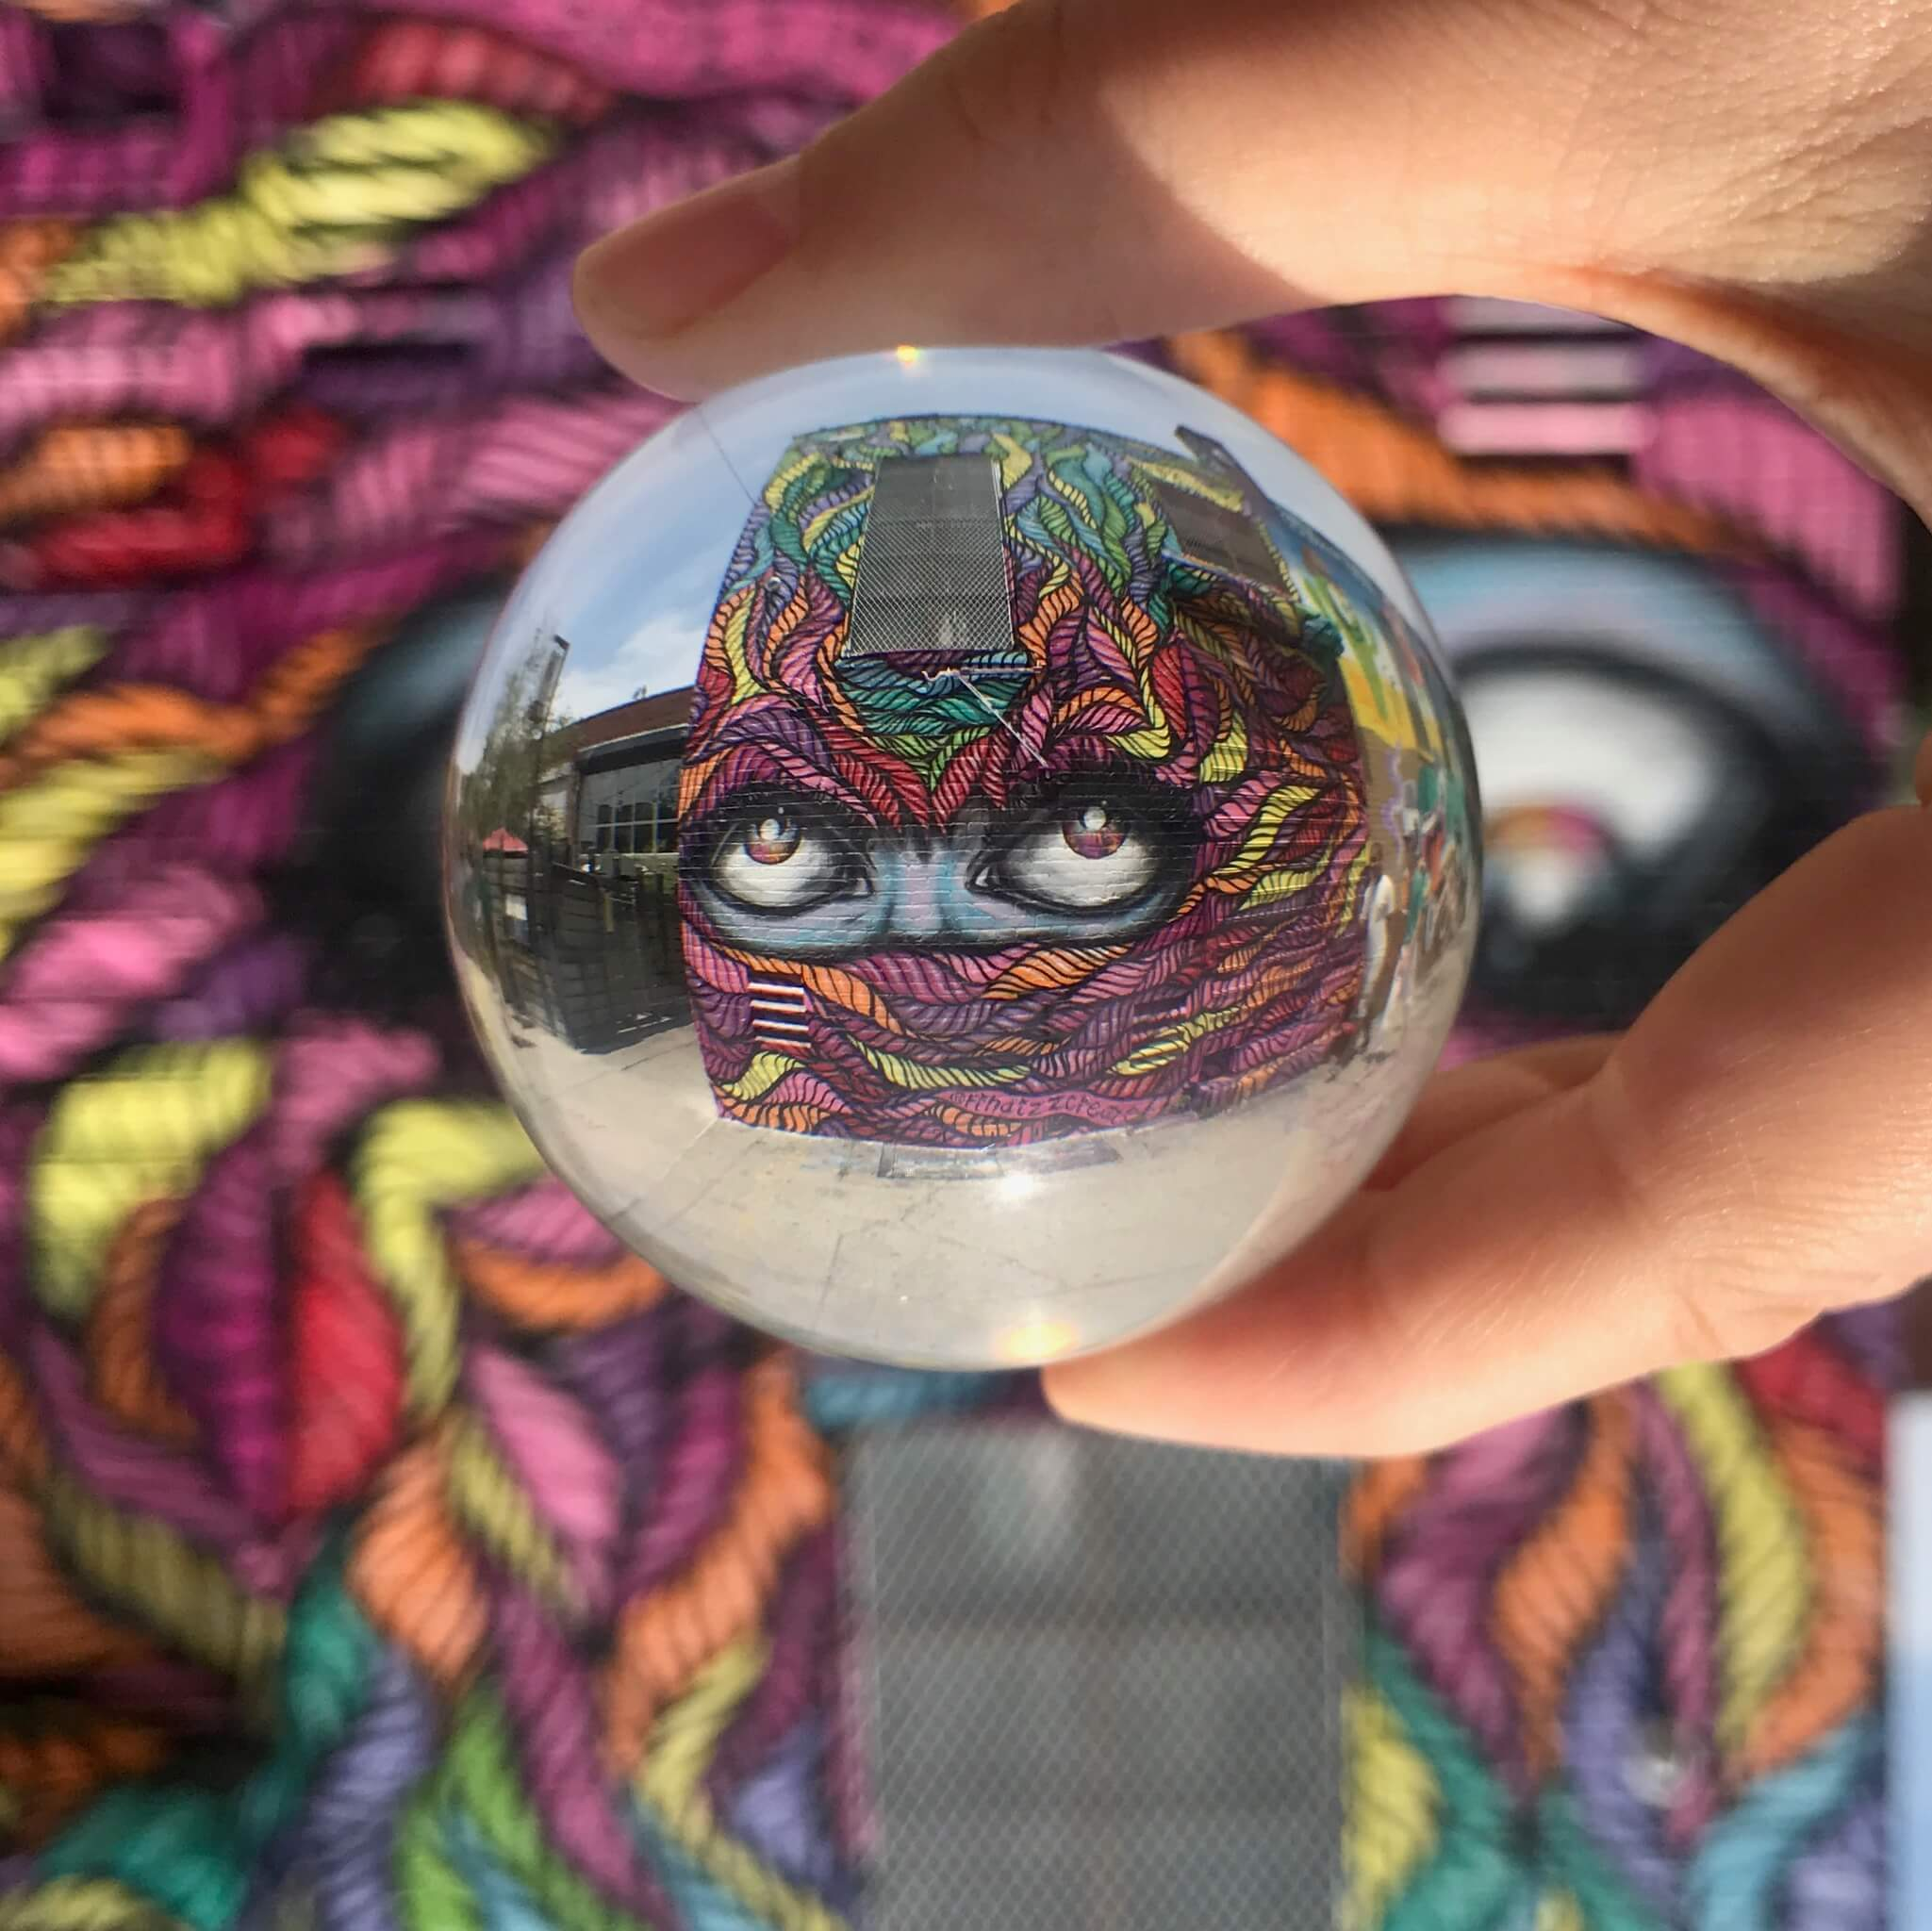 Mirror Ball Reflection Street Art Photography by Sarah Sansom